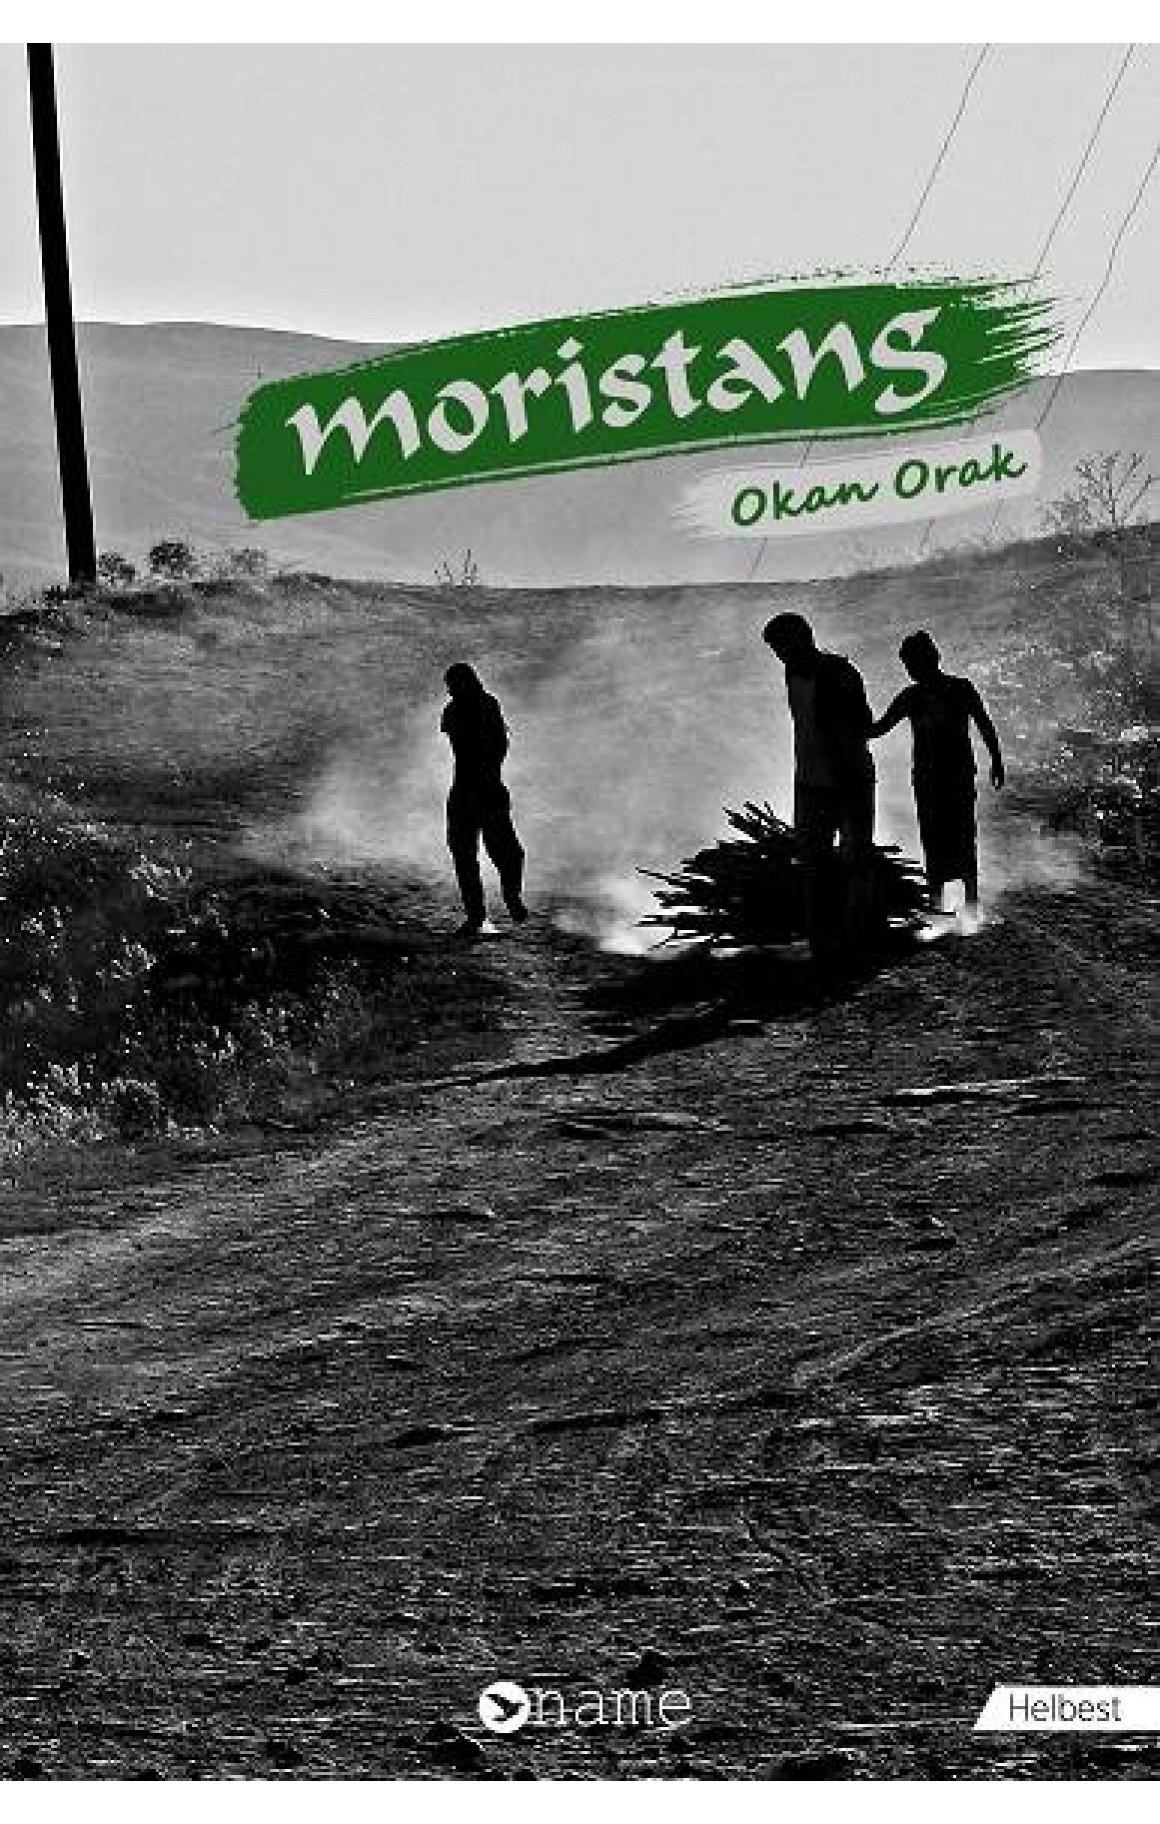 Moristang